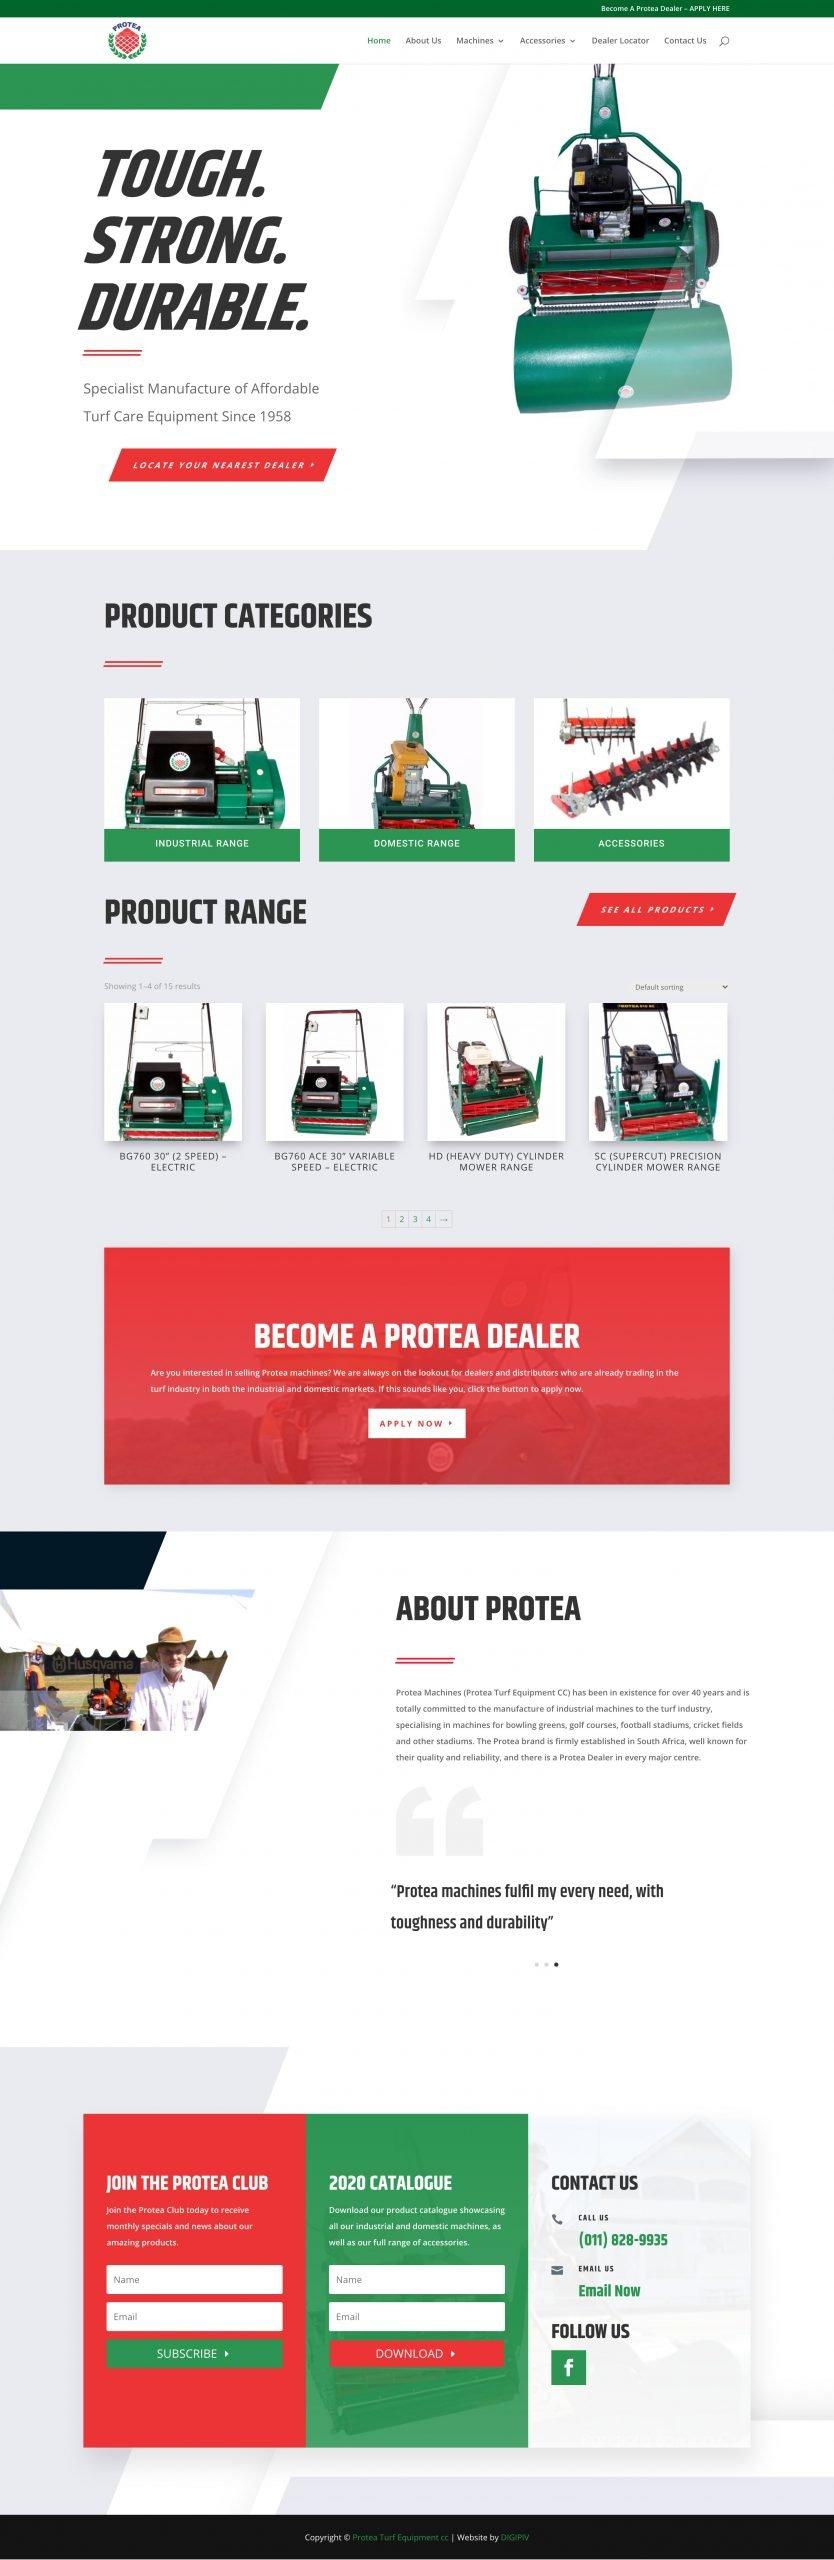 Protea Machines Homepage